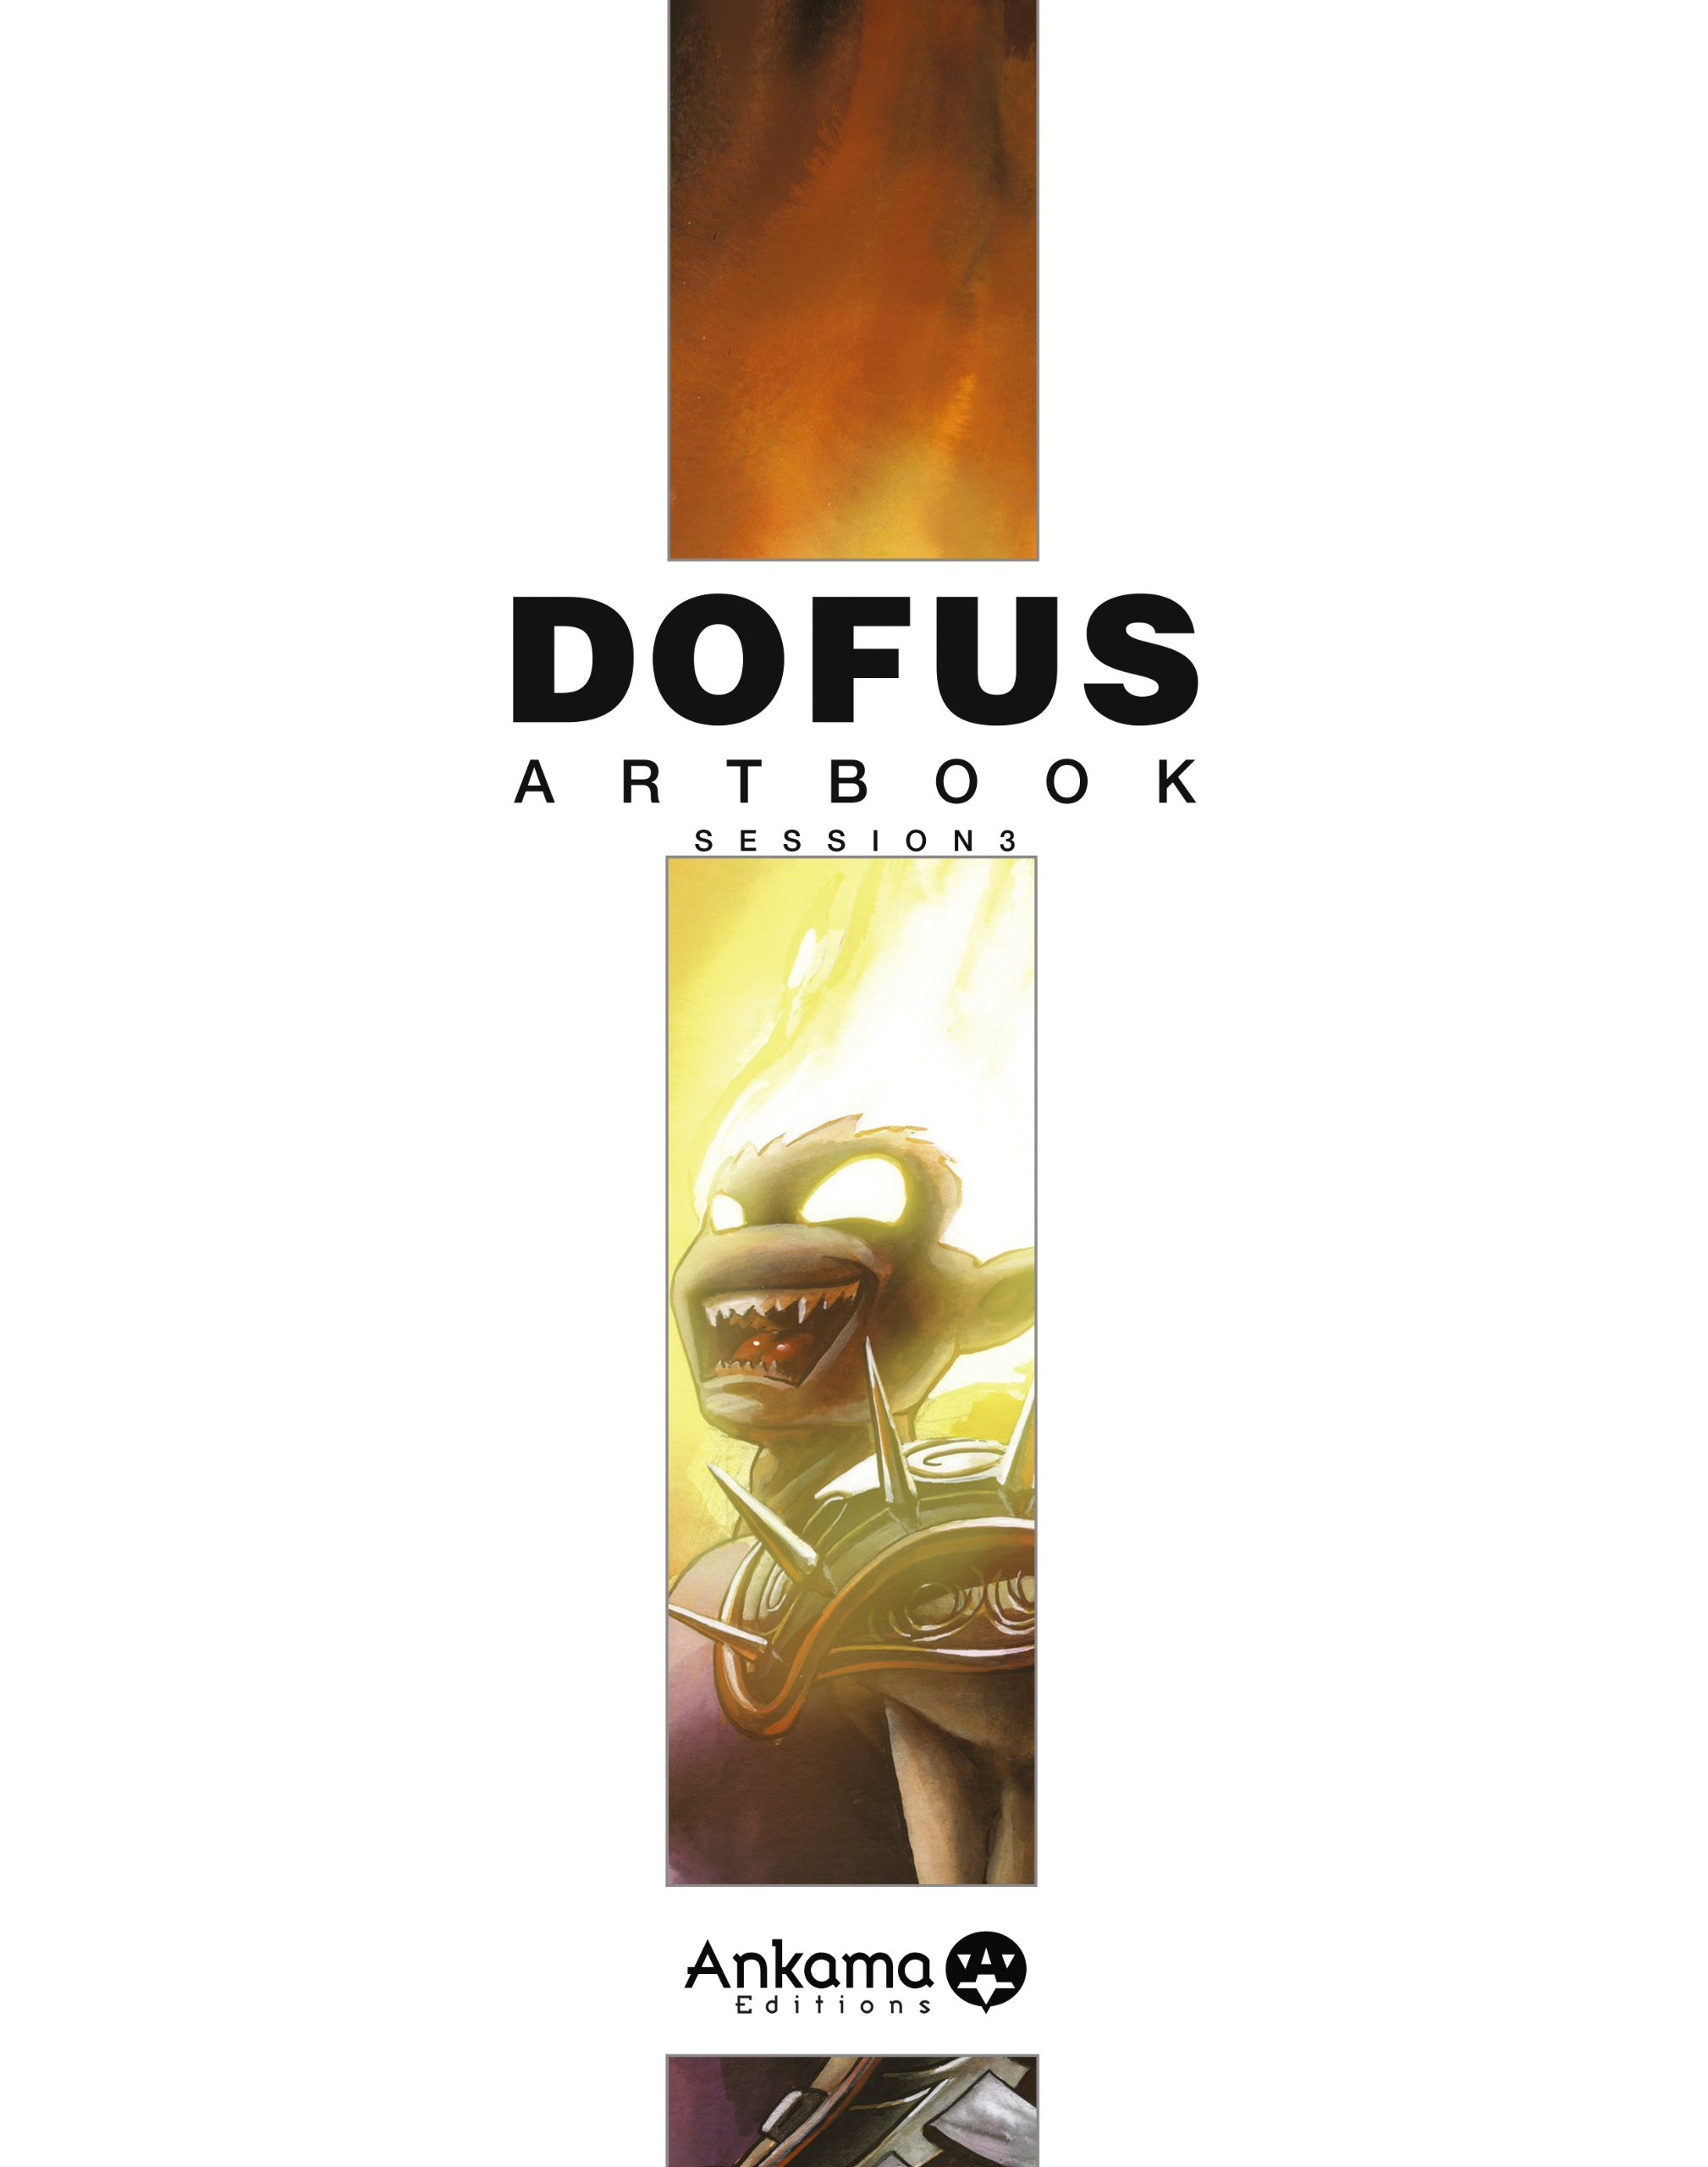 Dofus - Artbook Vol.3 Album – 6 septembre 2007 TOT Ankama 291673922X Manga